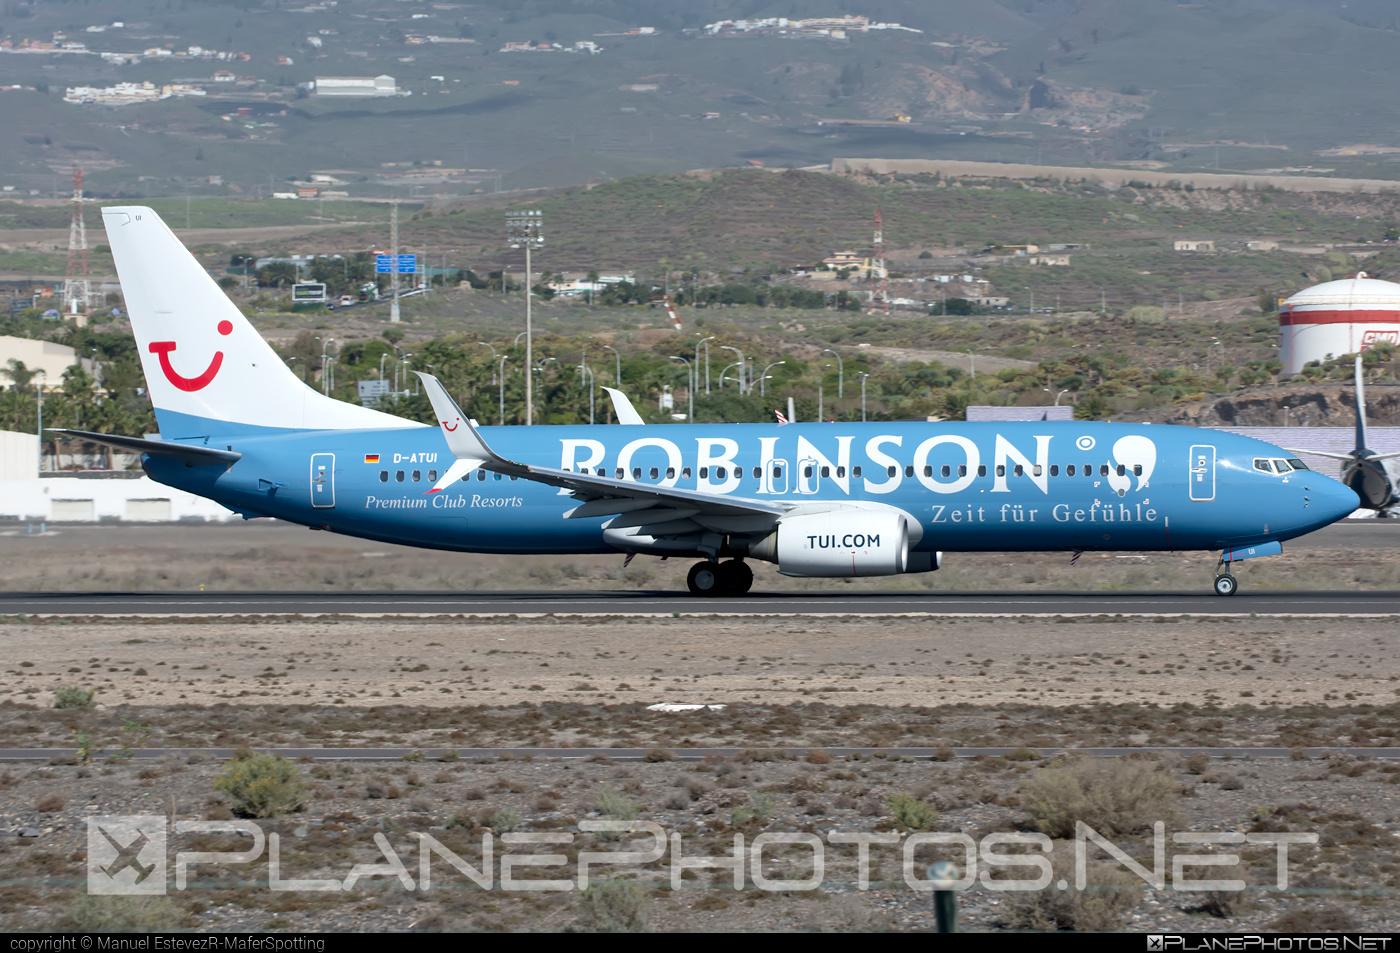 Boeing 737-800 - D-ATUI operated by TUIfly #b737 #b737nextgen #b737ng #boeing #boeing737 #tui #tuifly